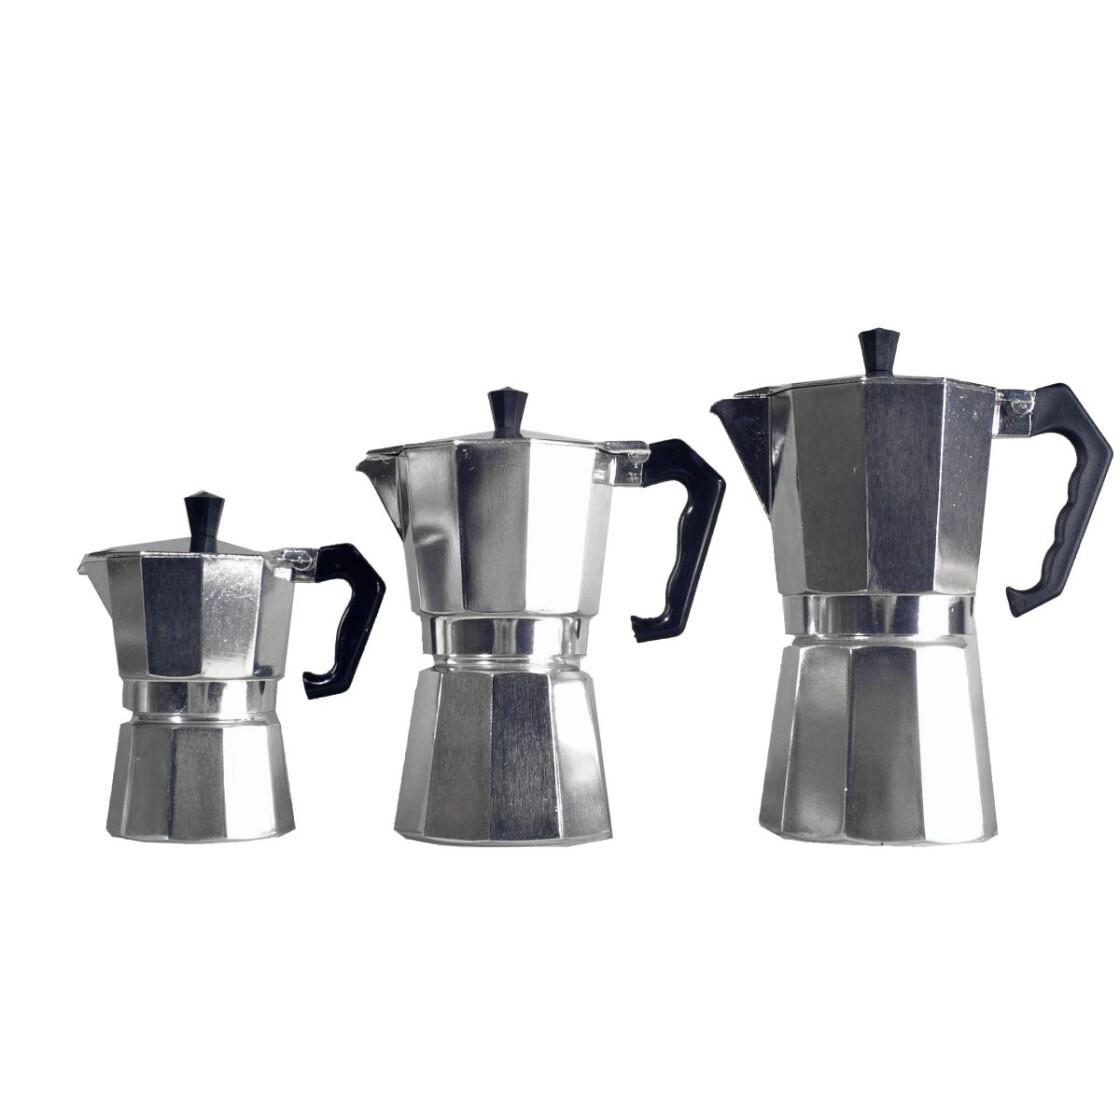 Tassen Maker Amsterdam : Relags espresso maker bellanapoli tassen